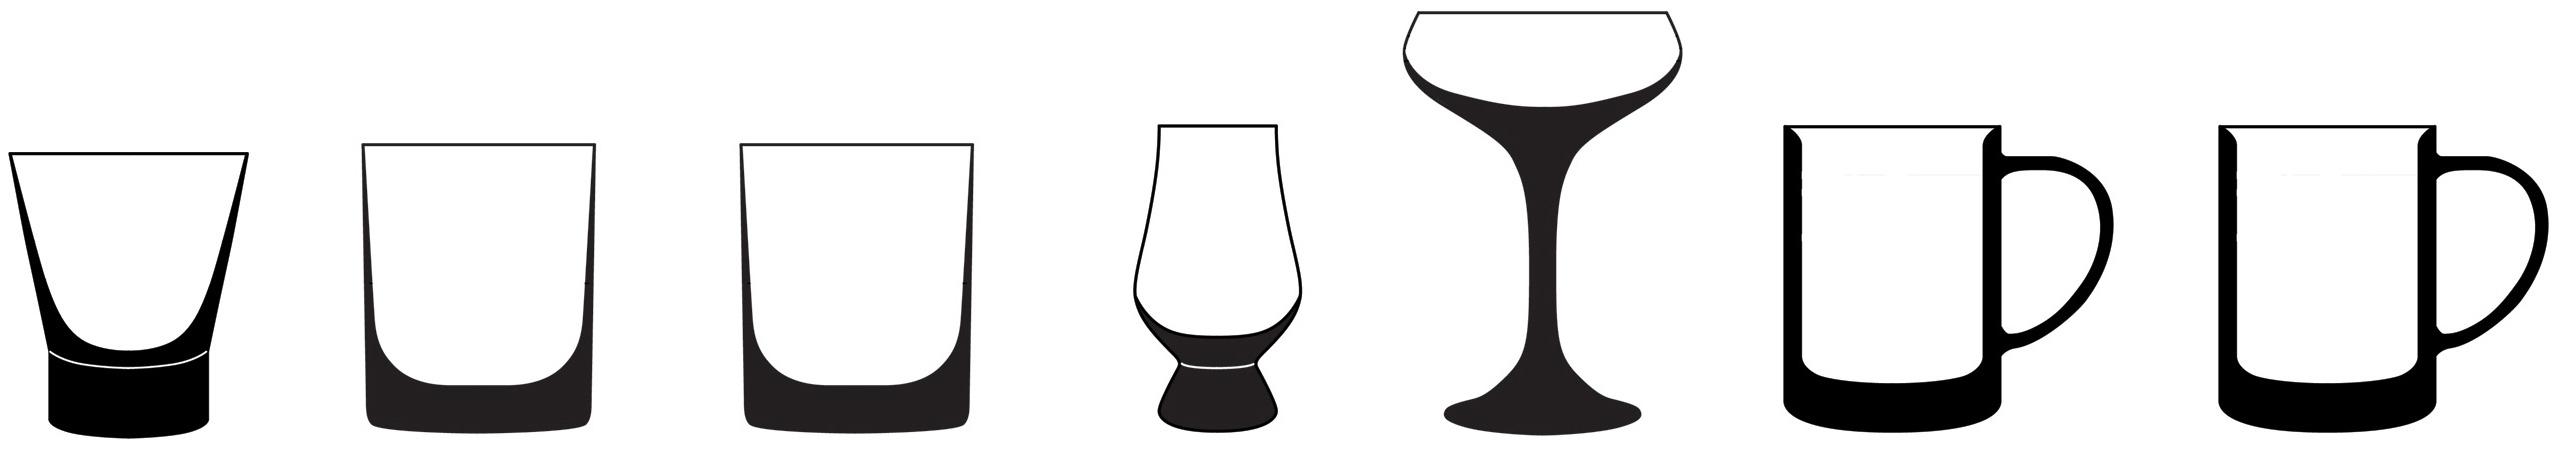 Lead-Image-glasses